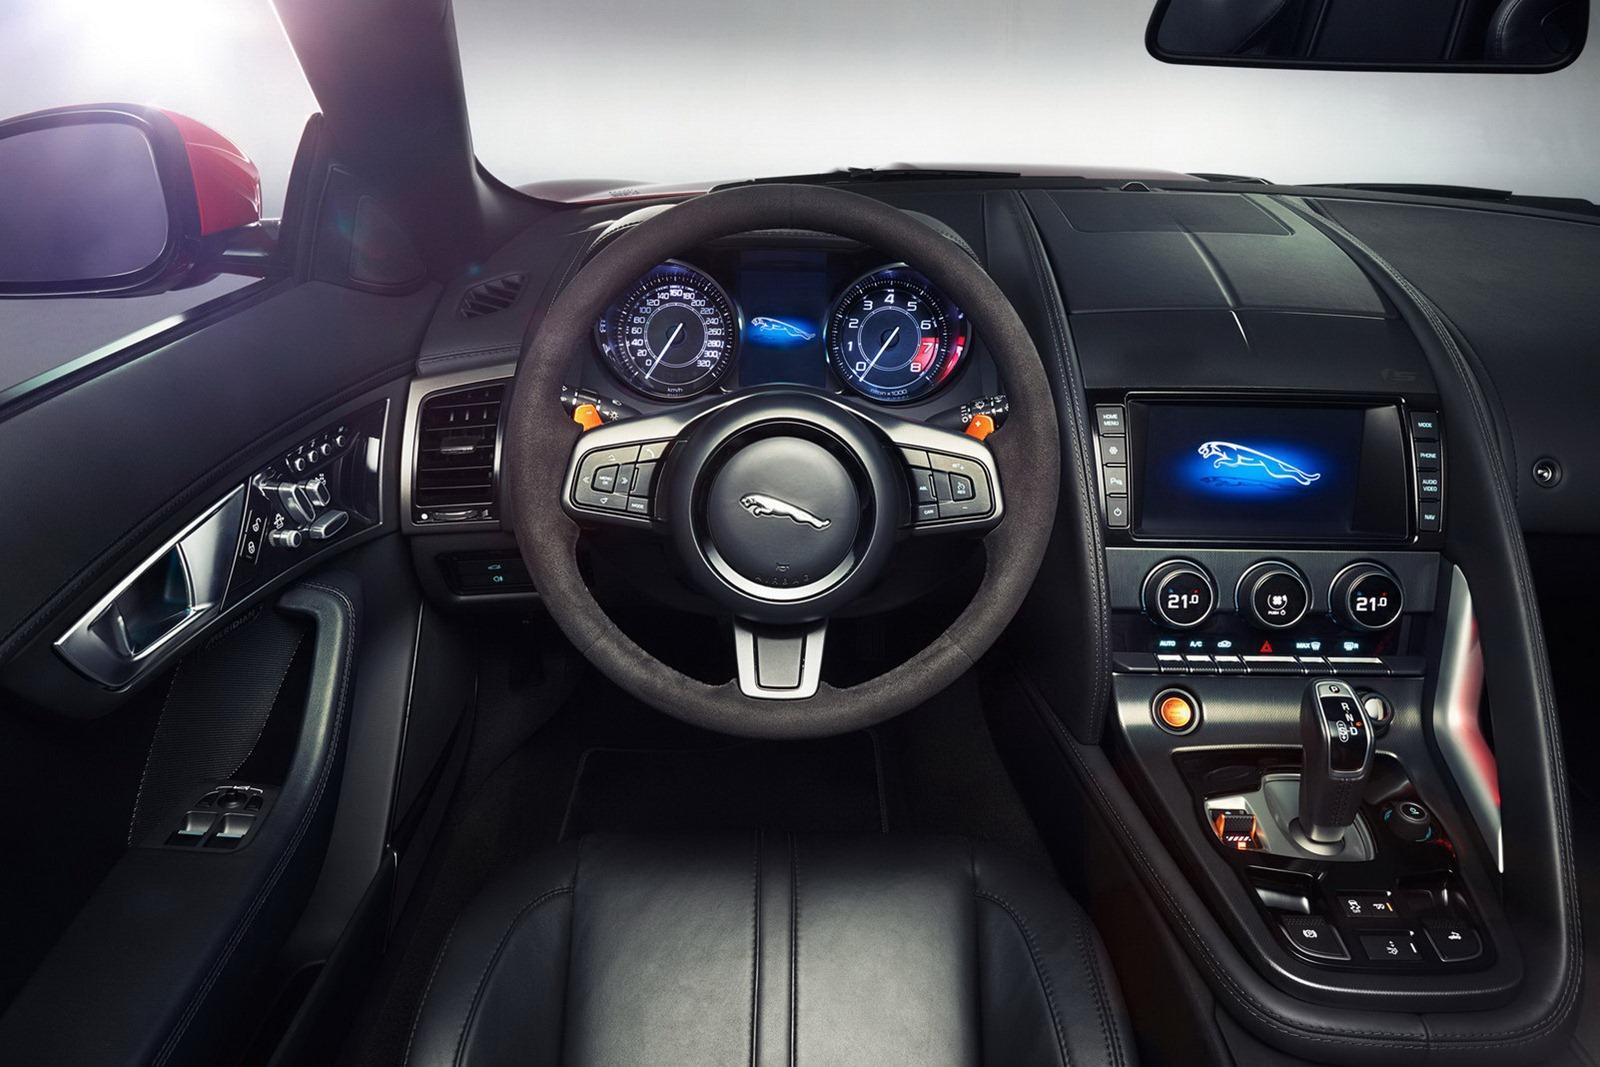 2013 jaguar f type roadster resmi olarak tan t ld turkeycarblog - Jaguar f type r coupe interior ...